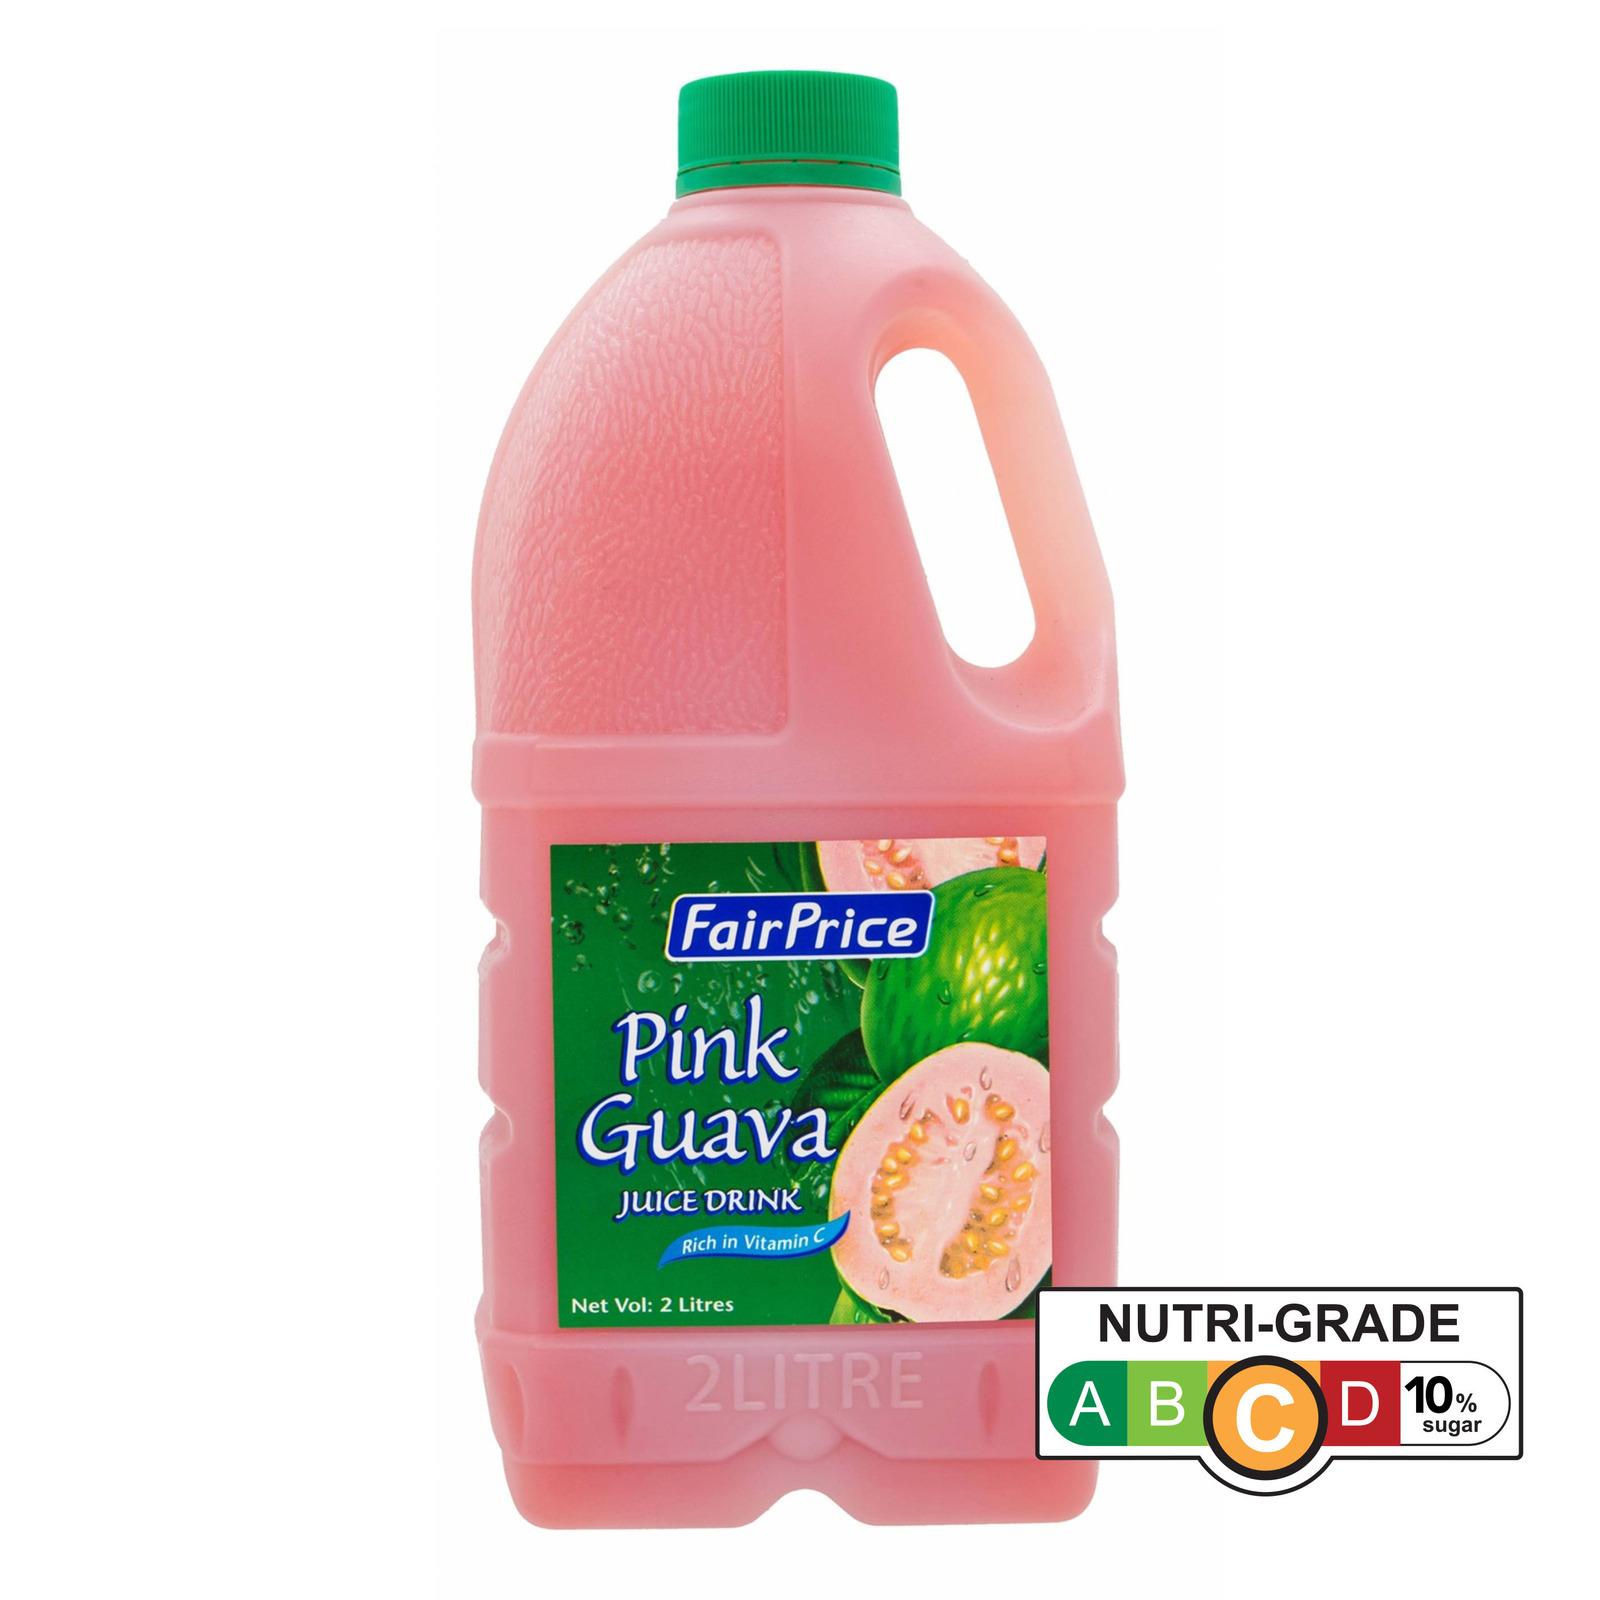 FairPrice Bottle Juice - Pink Guava